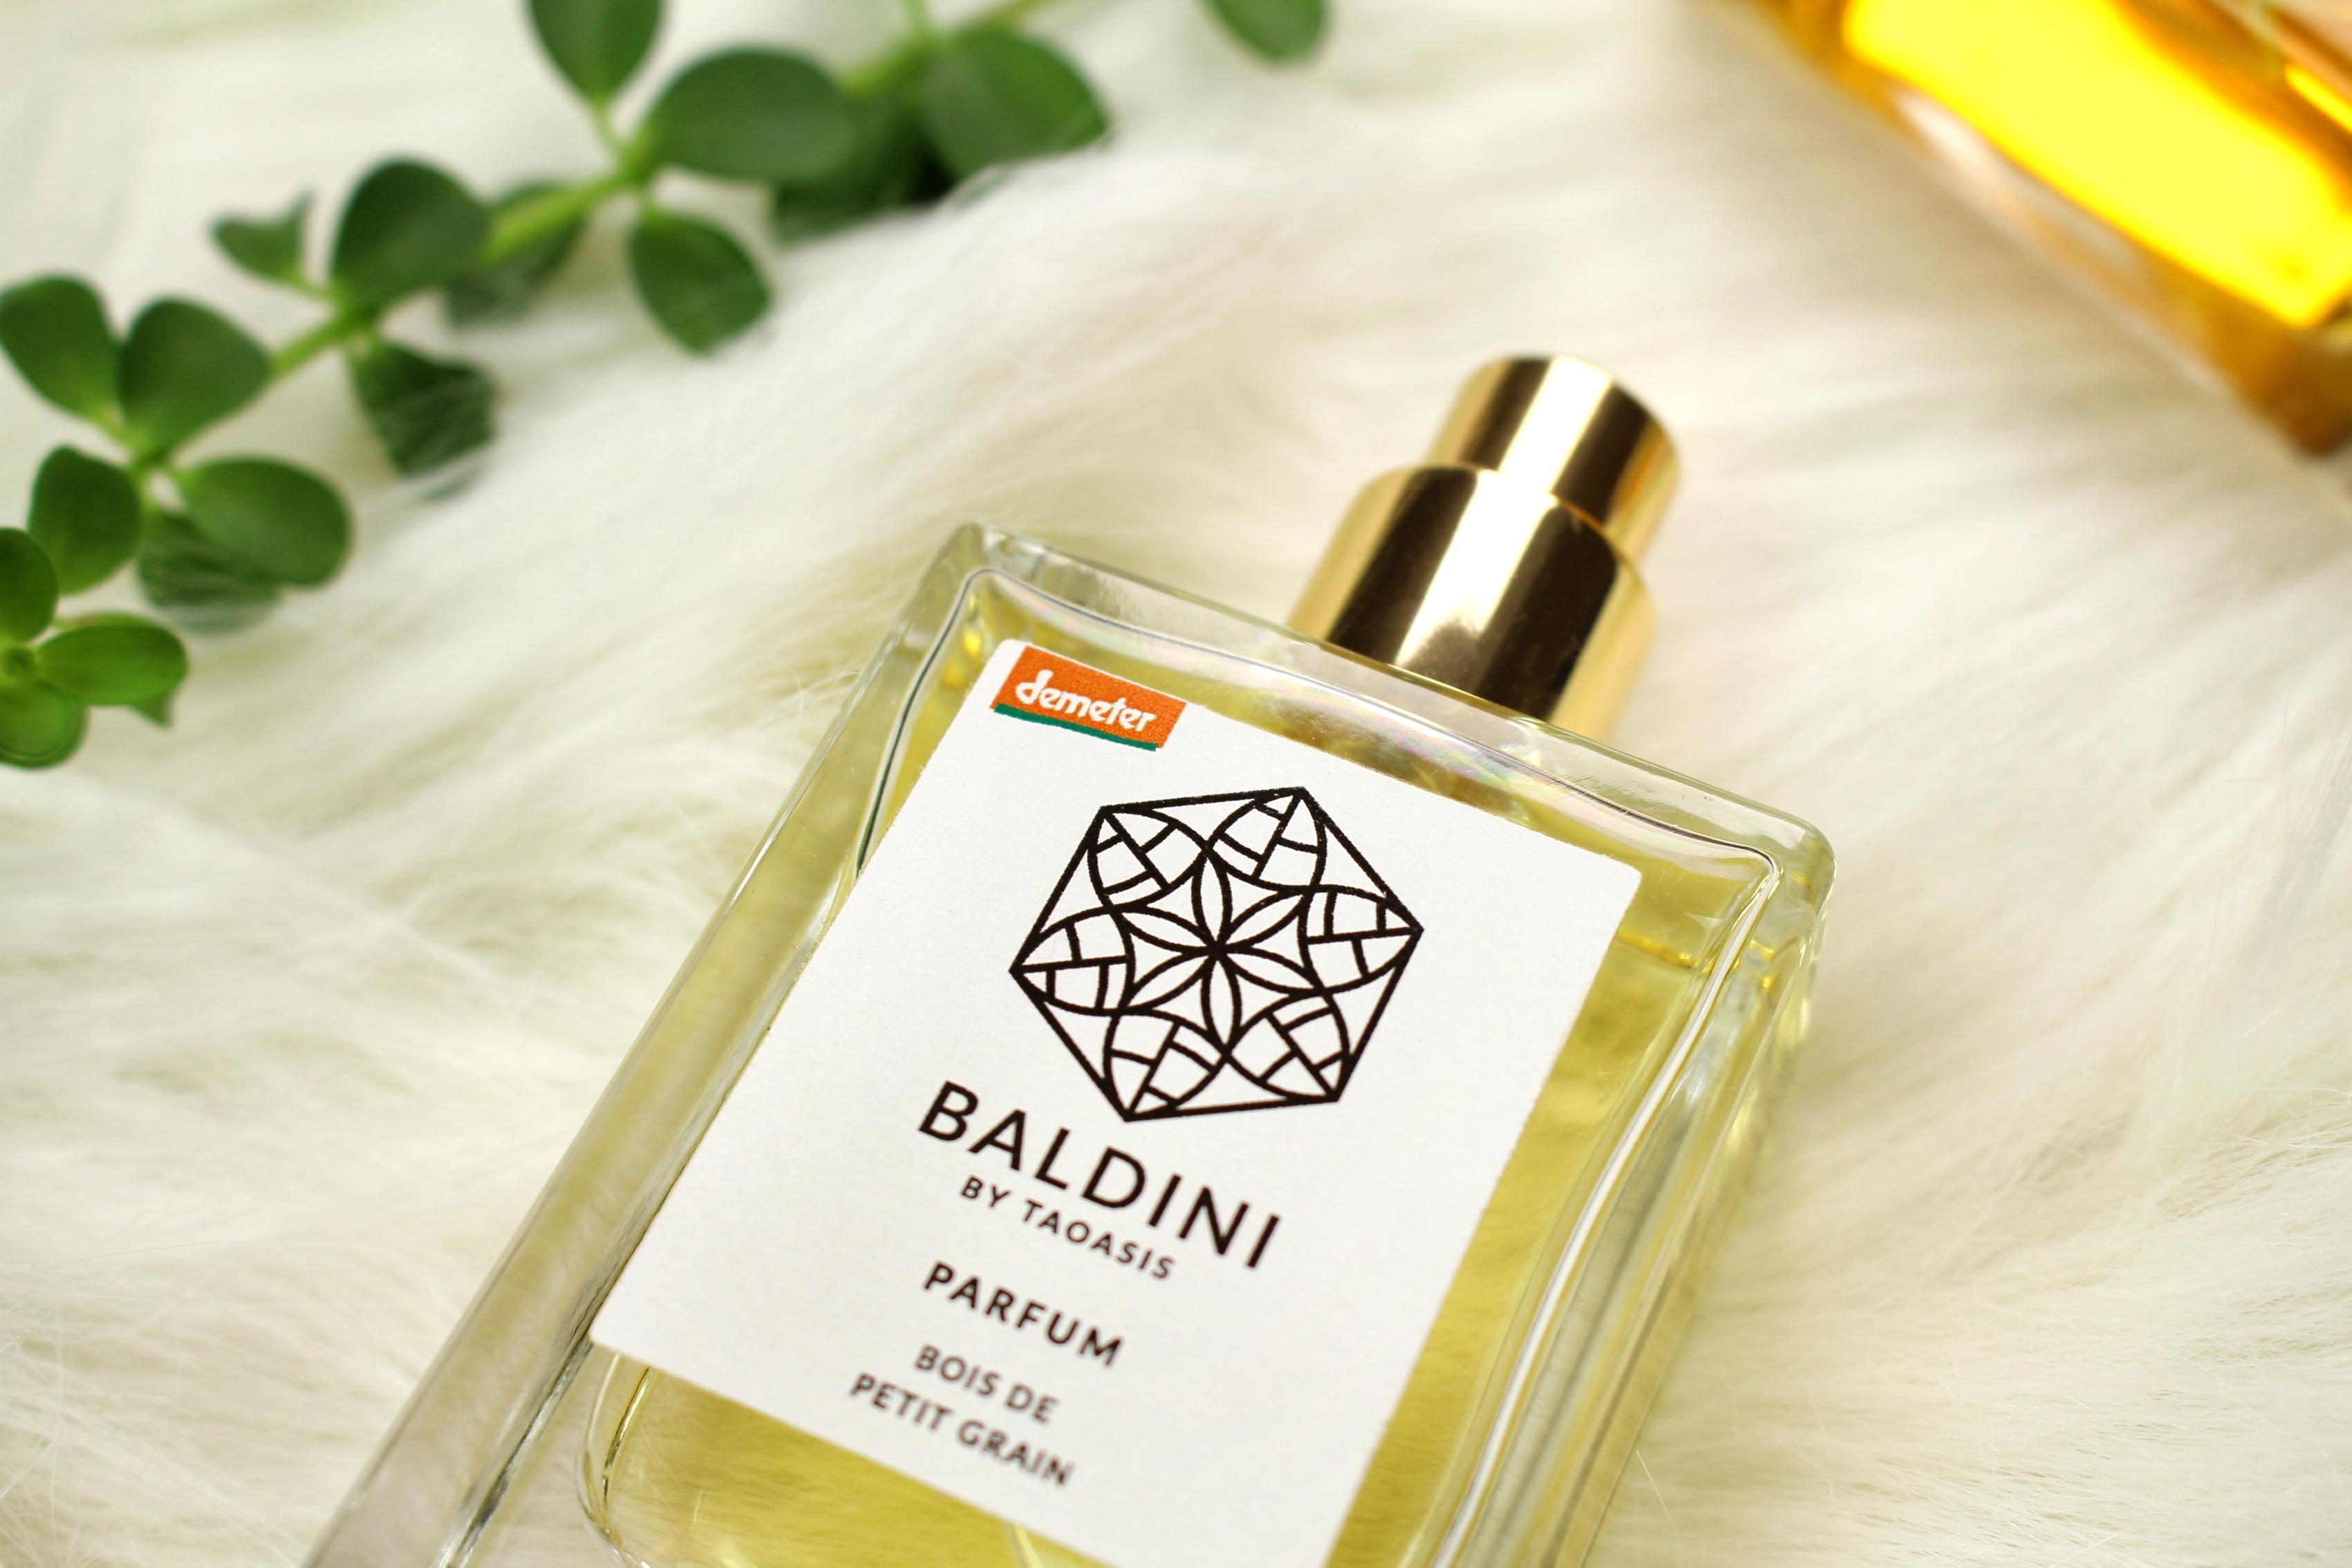 baldini-naturparfum-fleur-de-mandarine-taoasis-demeter